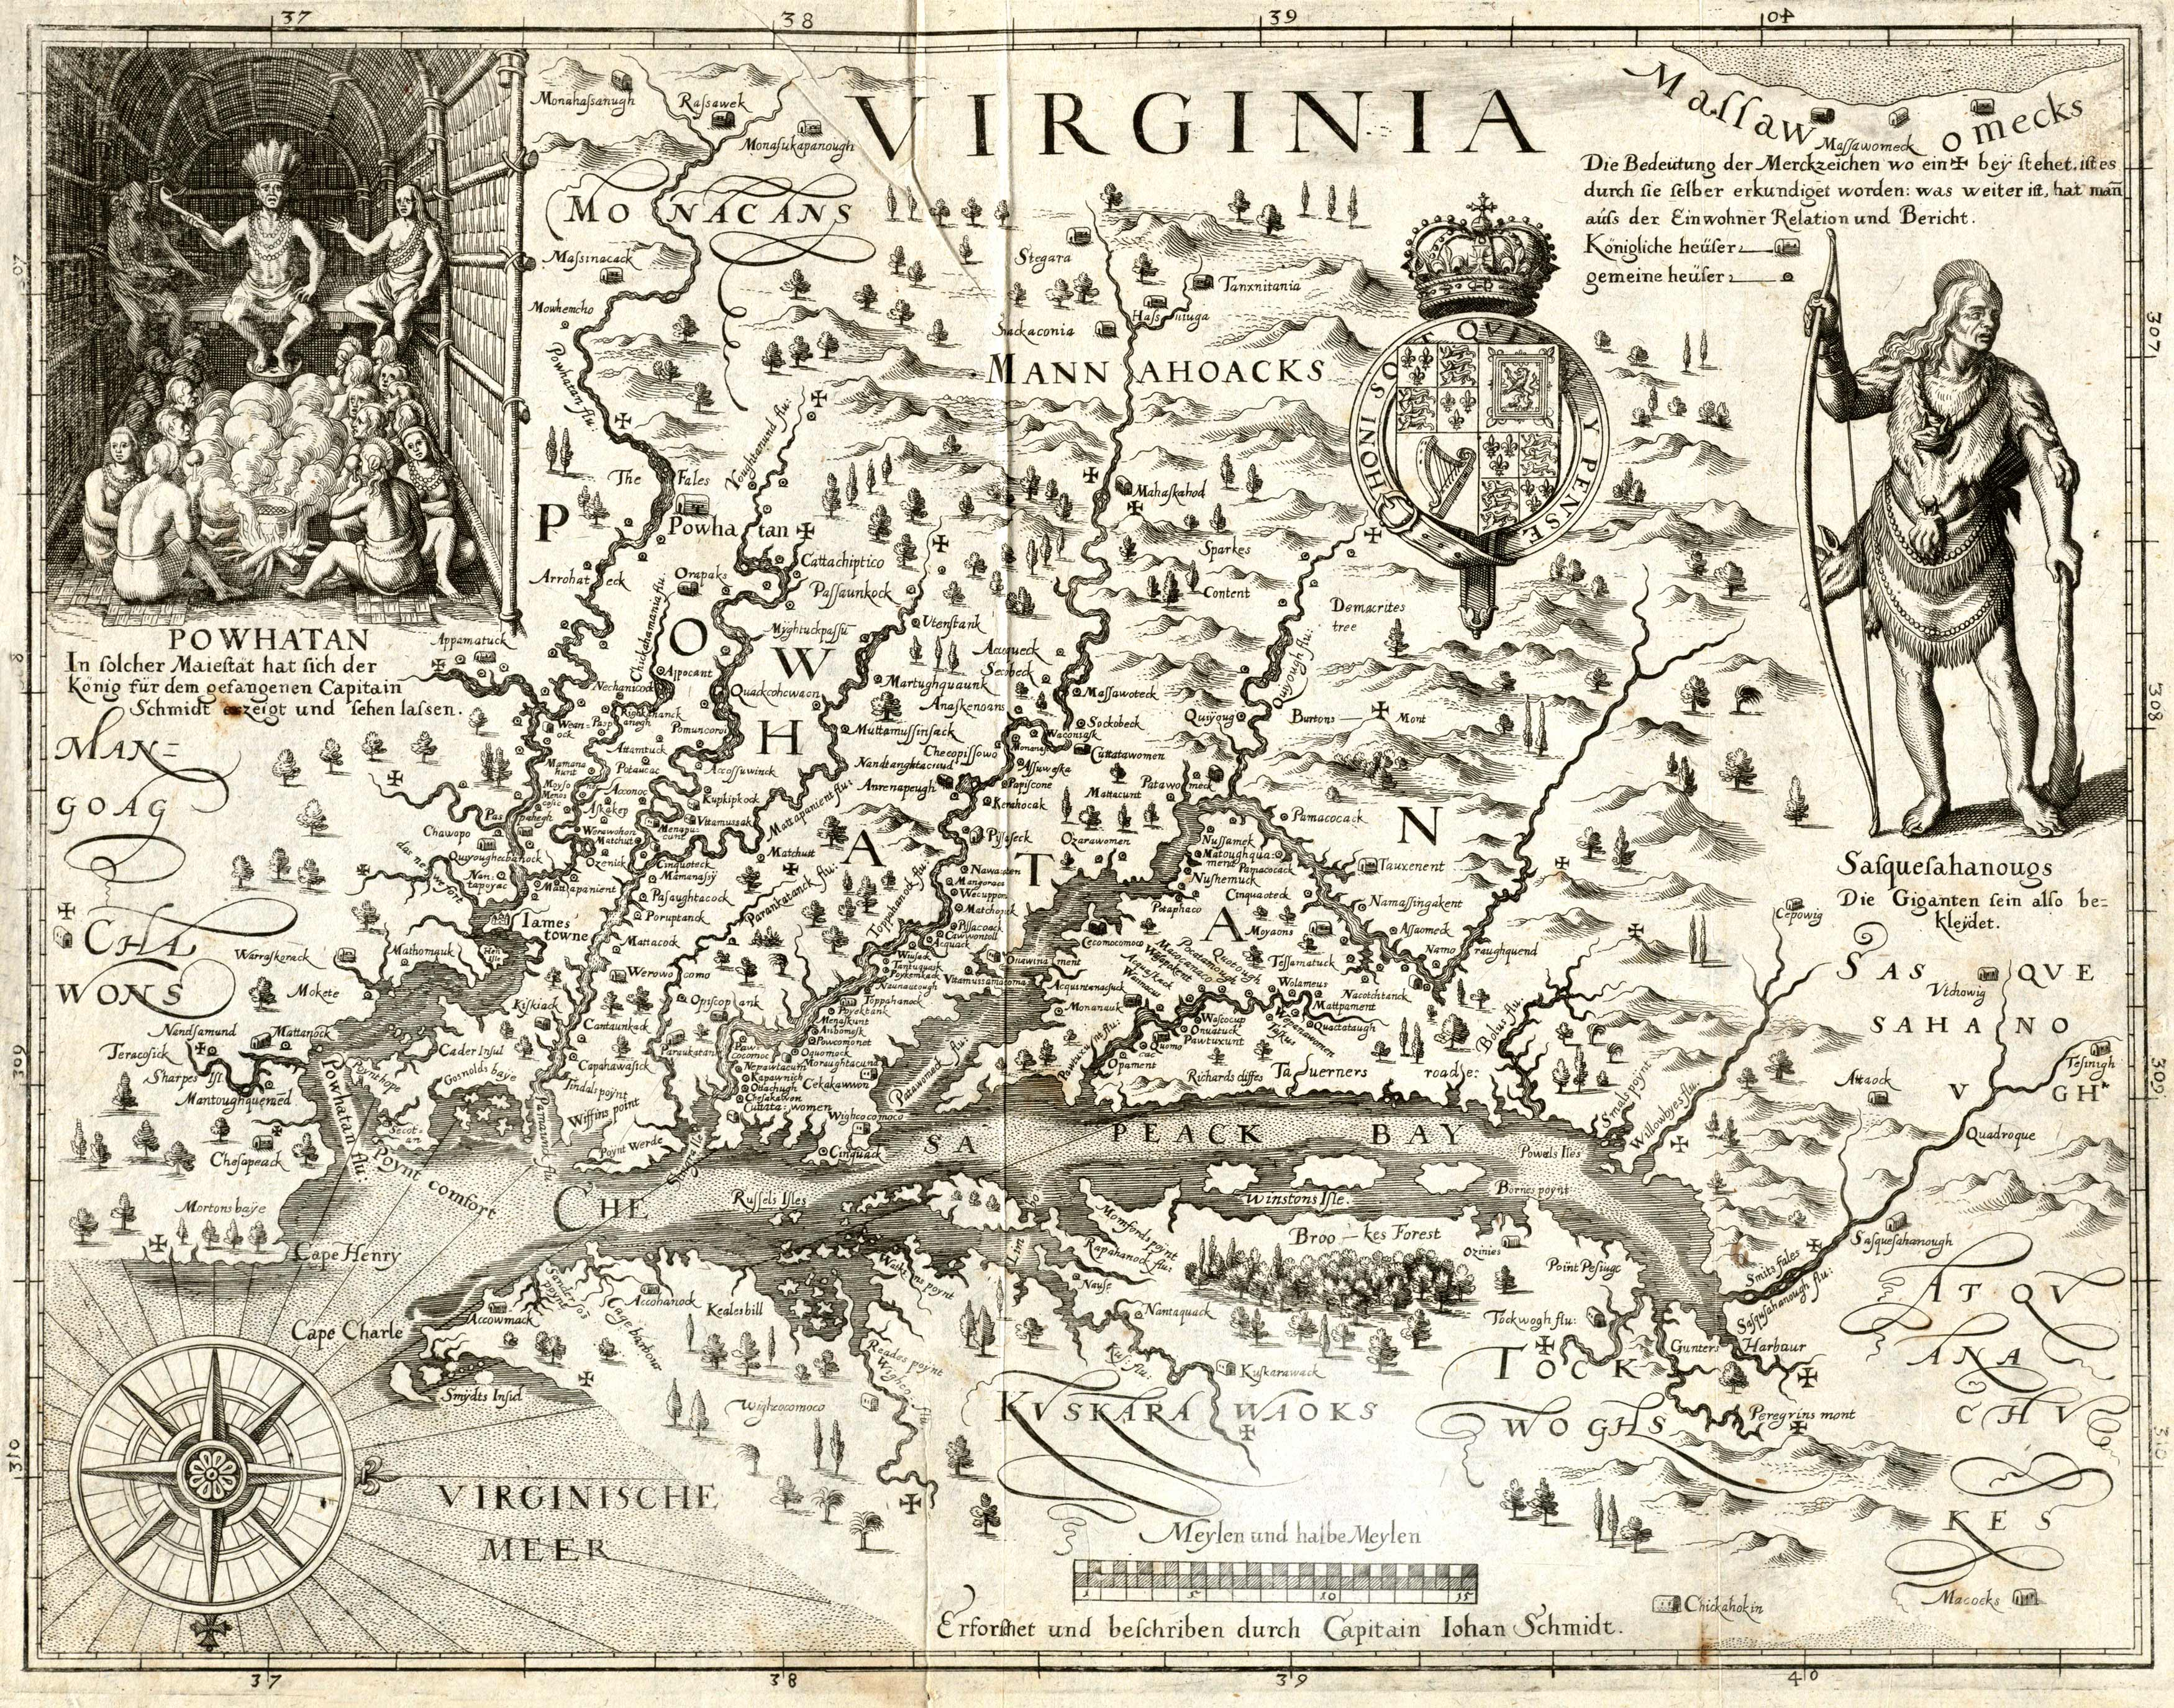 John Smith's Map of 1612